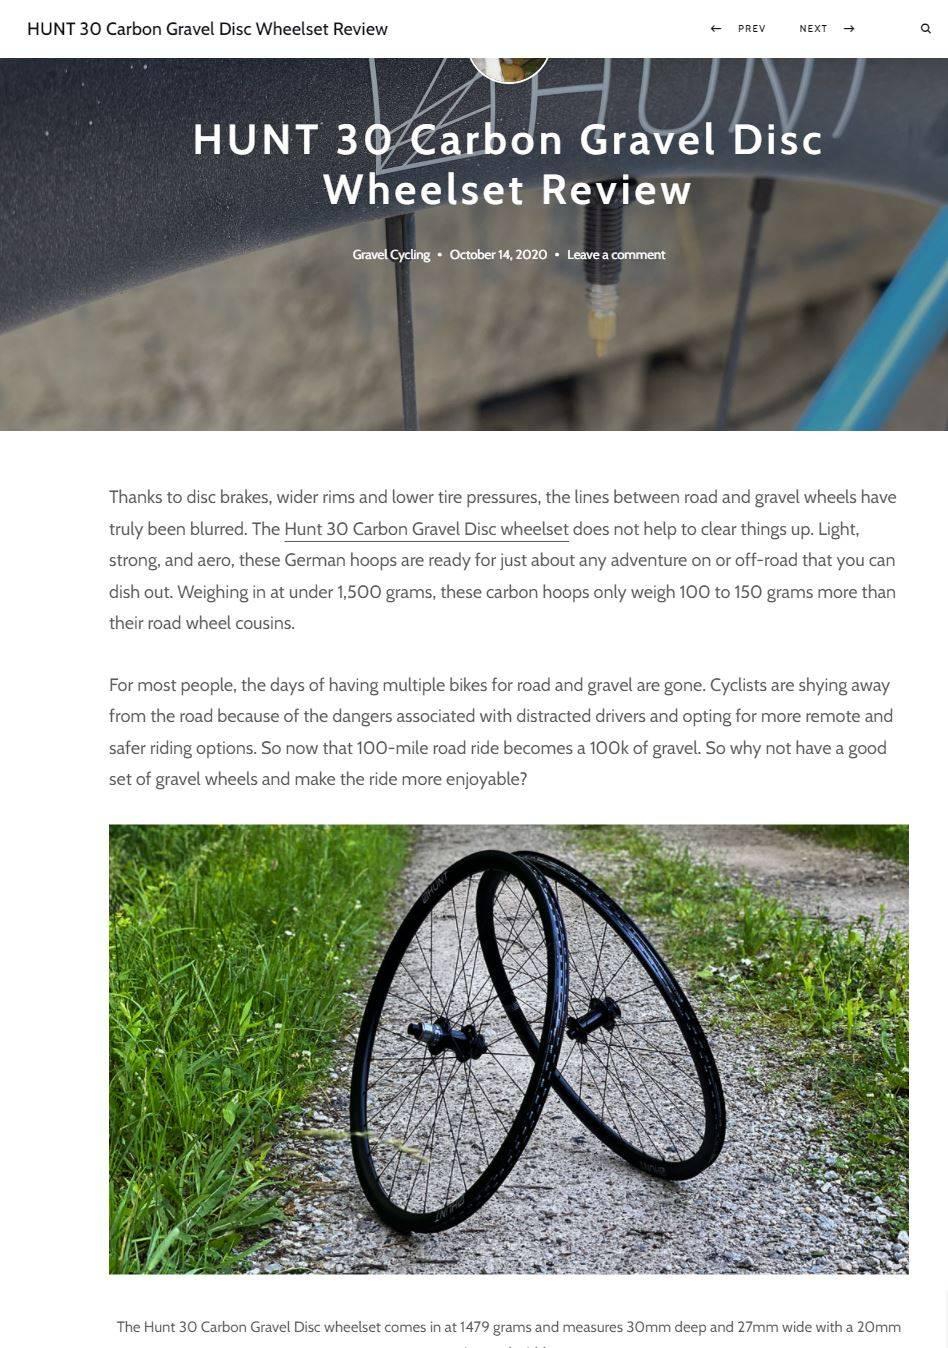 Hunt 30 Carbon Gravel Disc Wheelset Carbon and Grit review